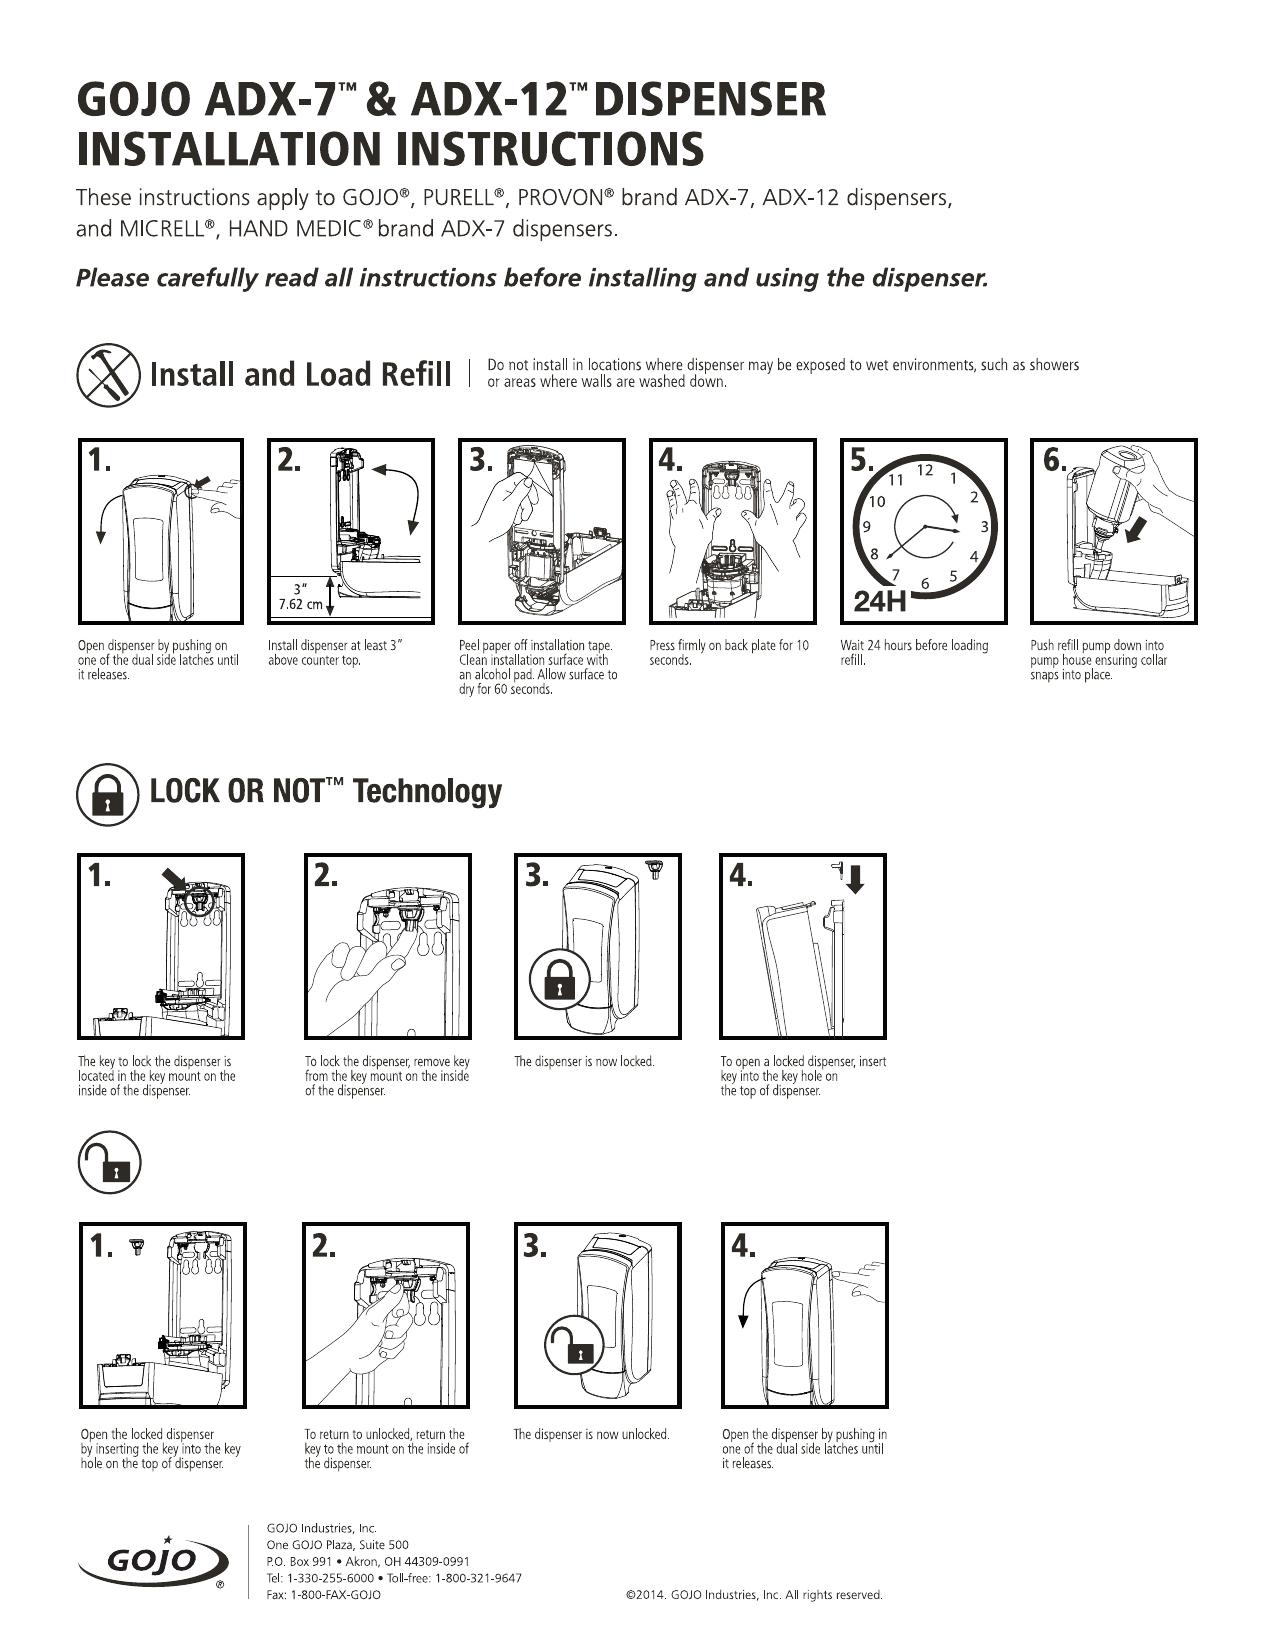 Sapphire Manual Soap Dispenser Manual Guide